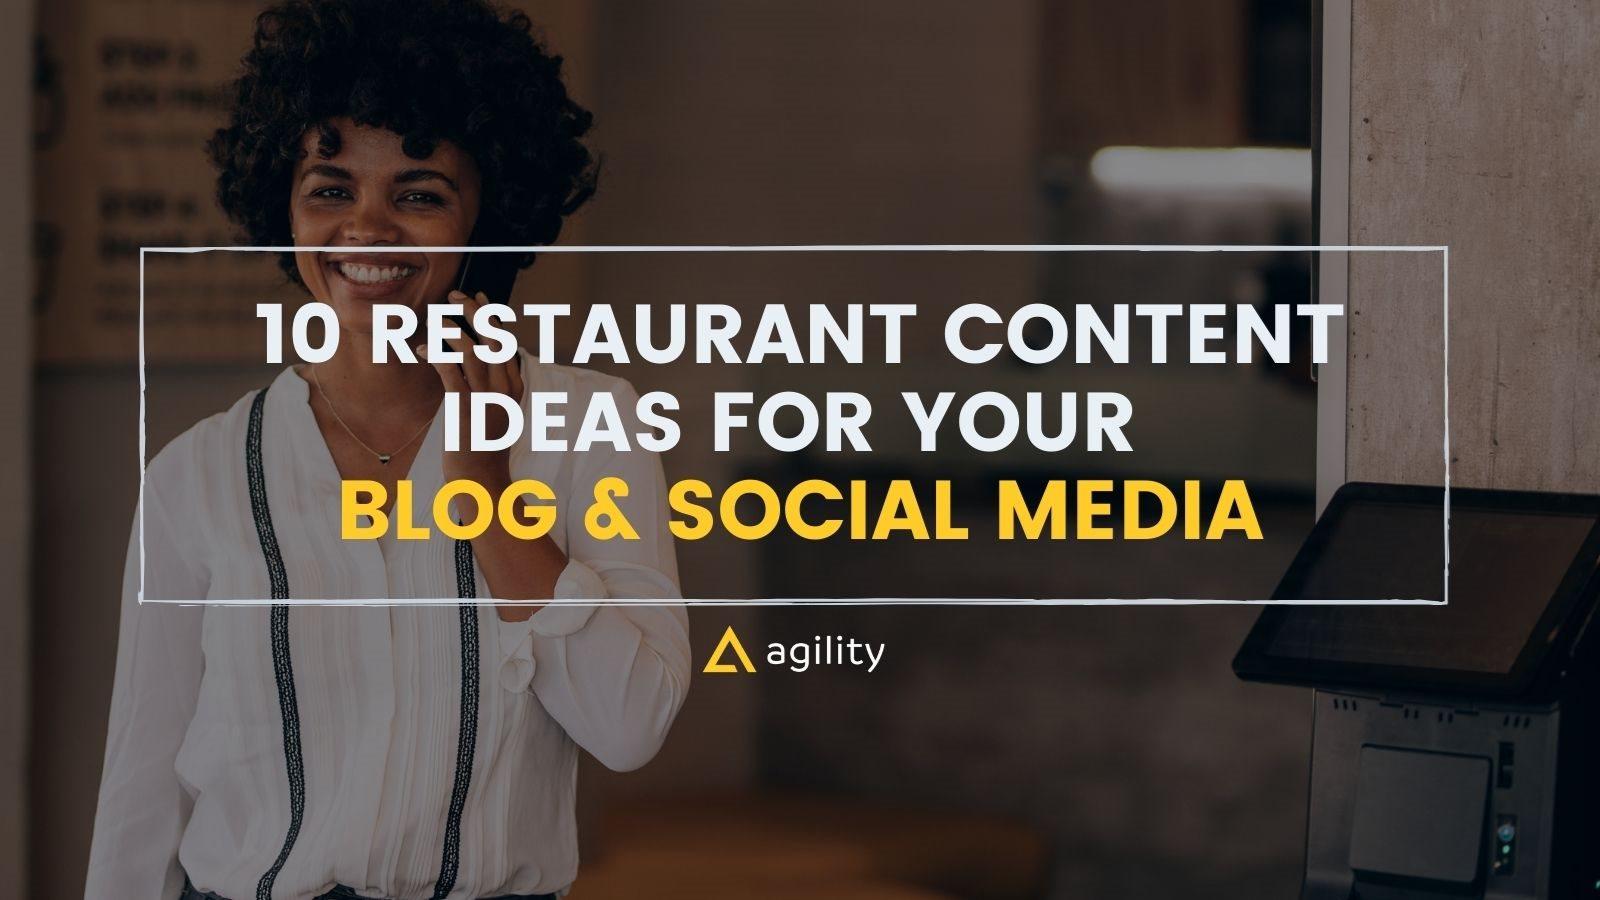 10 Restaurant Content Ideas for Your Blog & Social Media